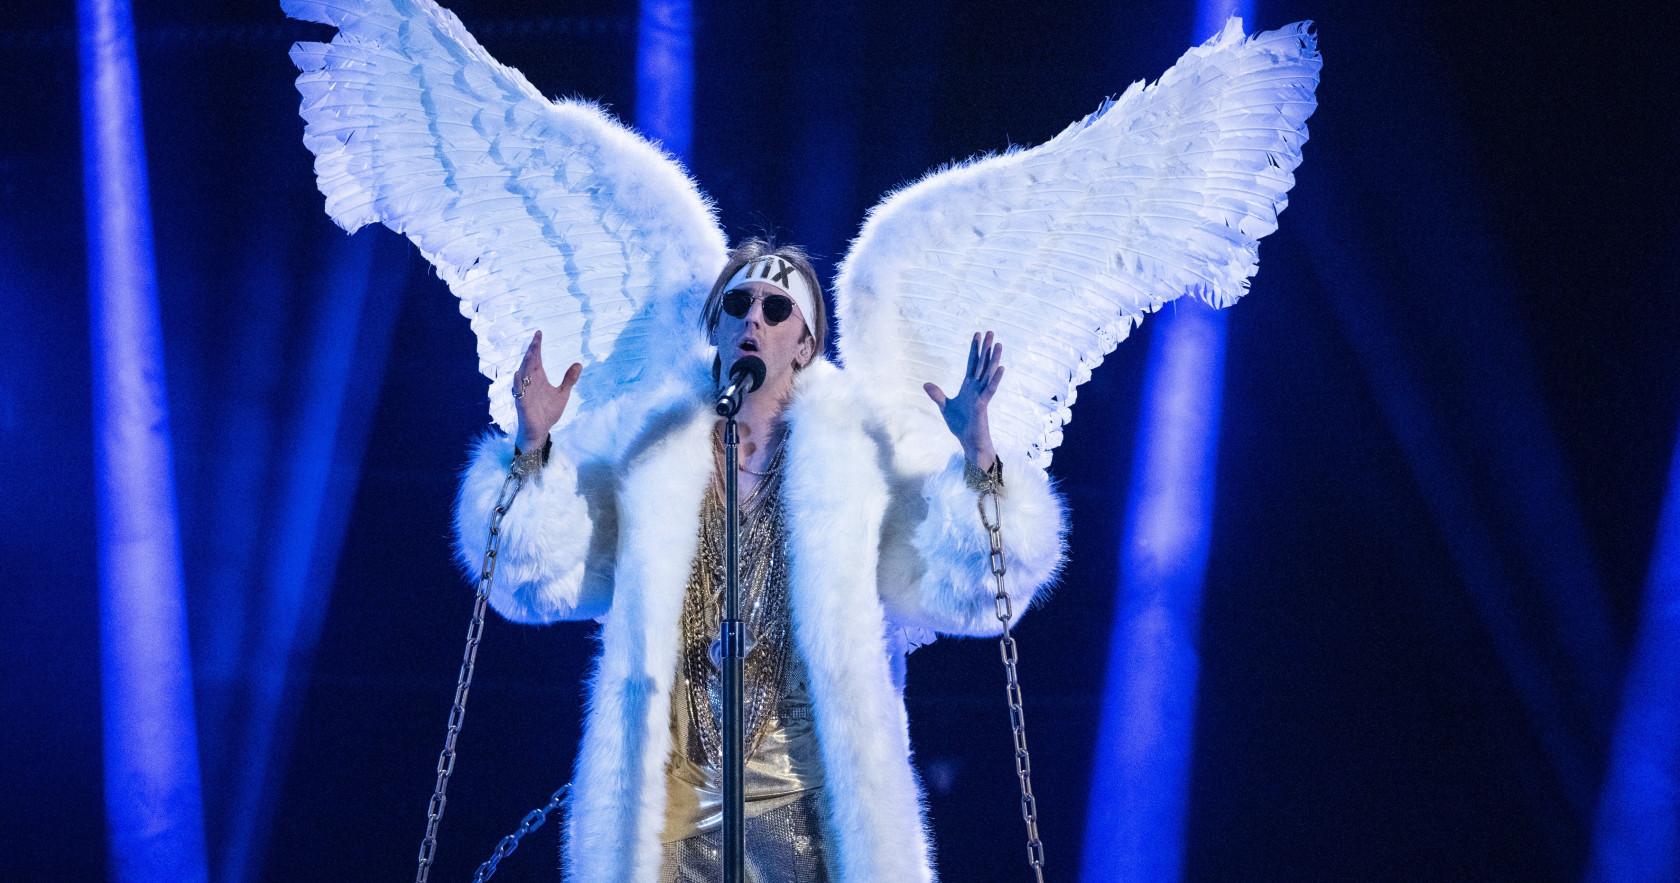 TIX représentera la Norvège à l'Eurovision 2021